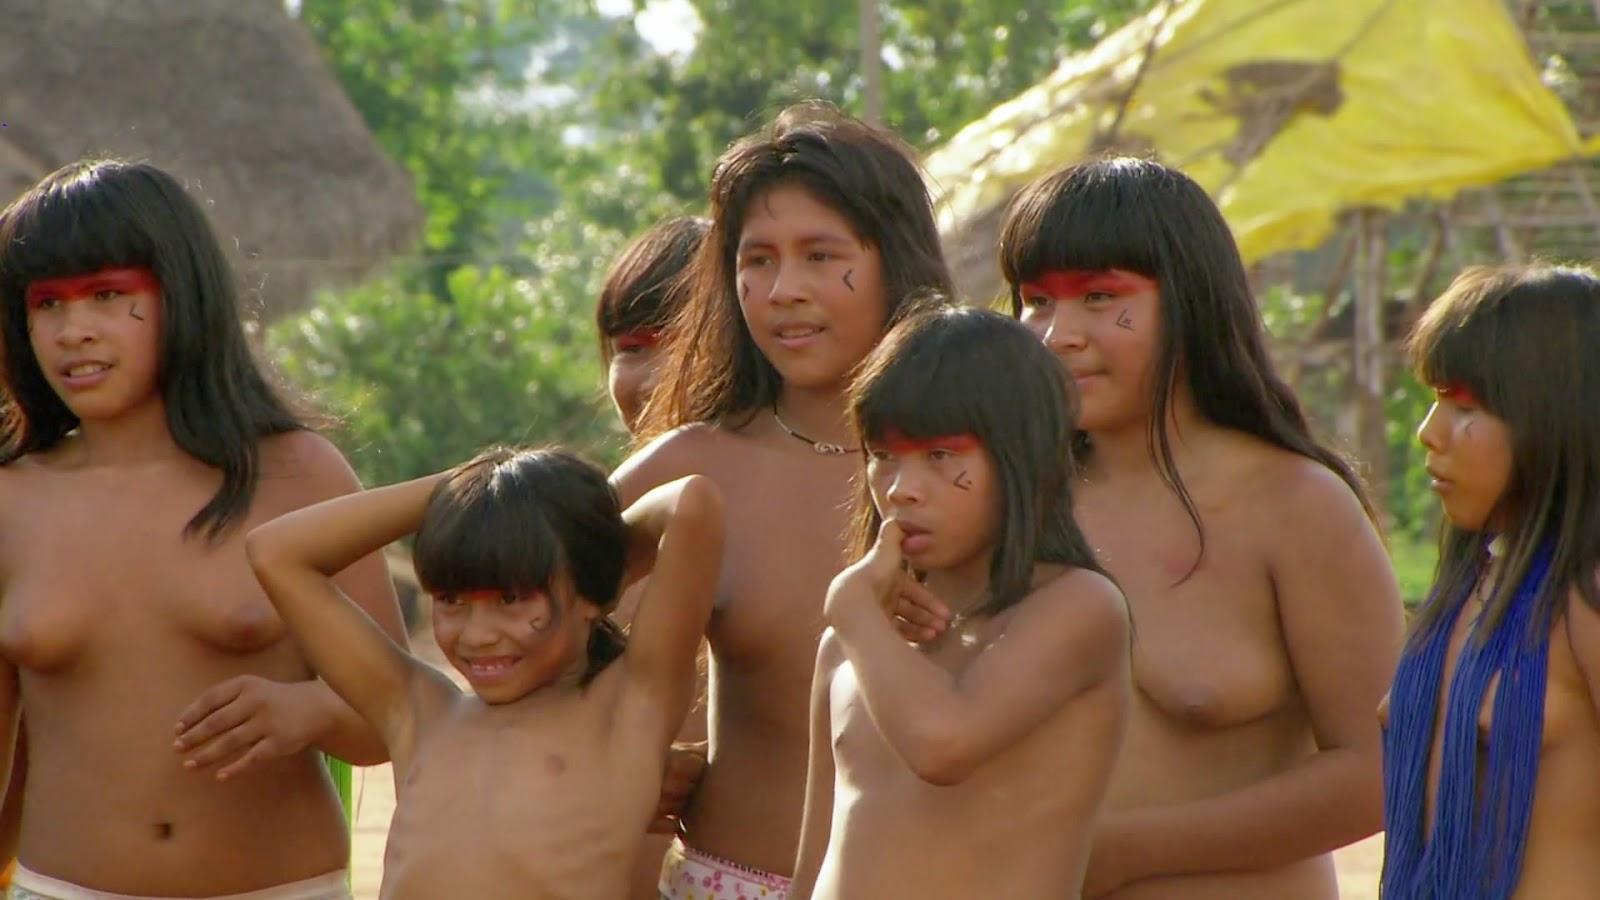 Слезы Амазонки / Tears of the Amazon. 2010.